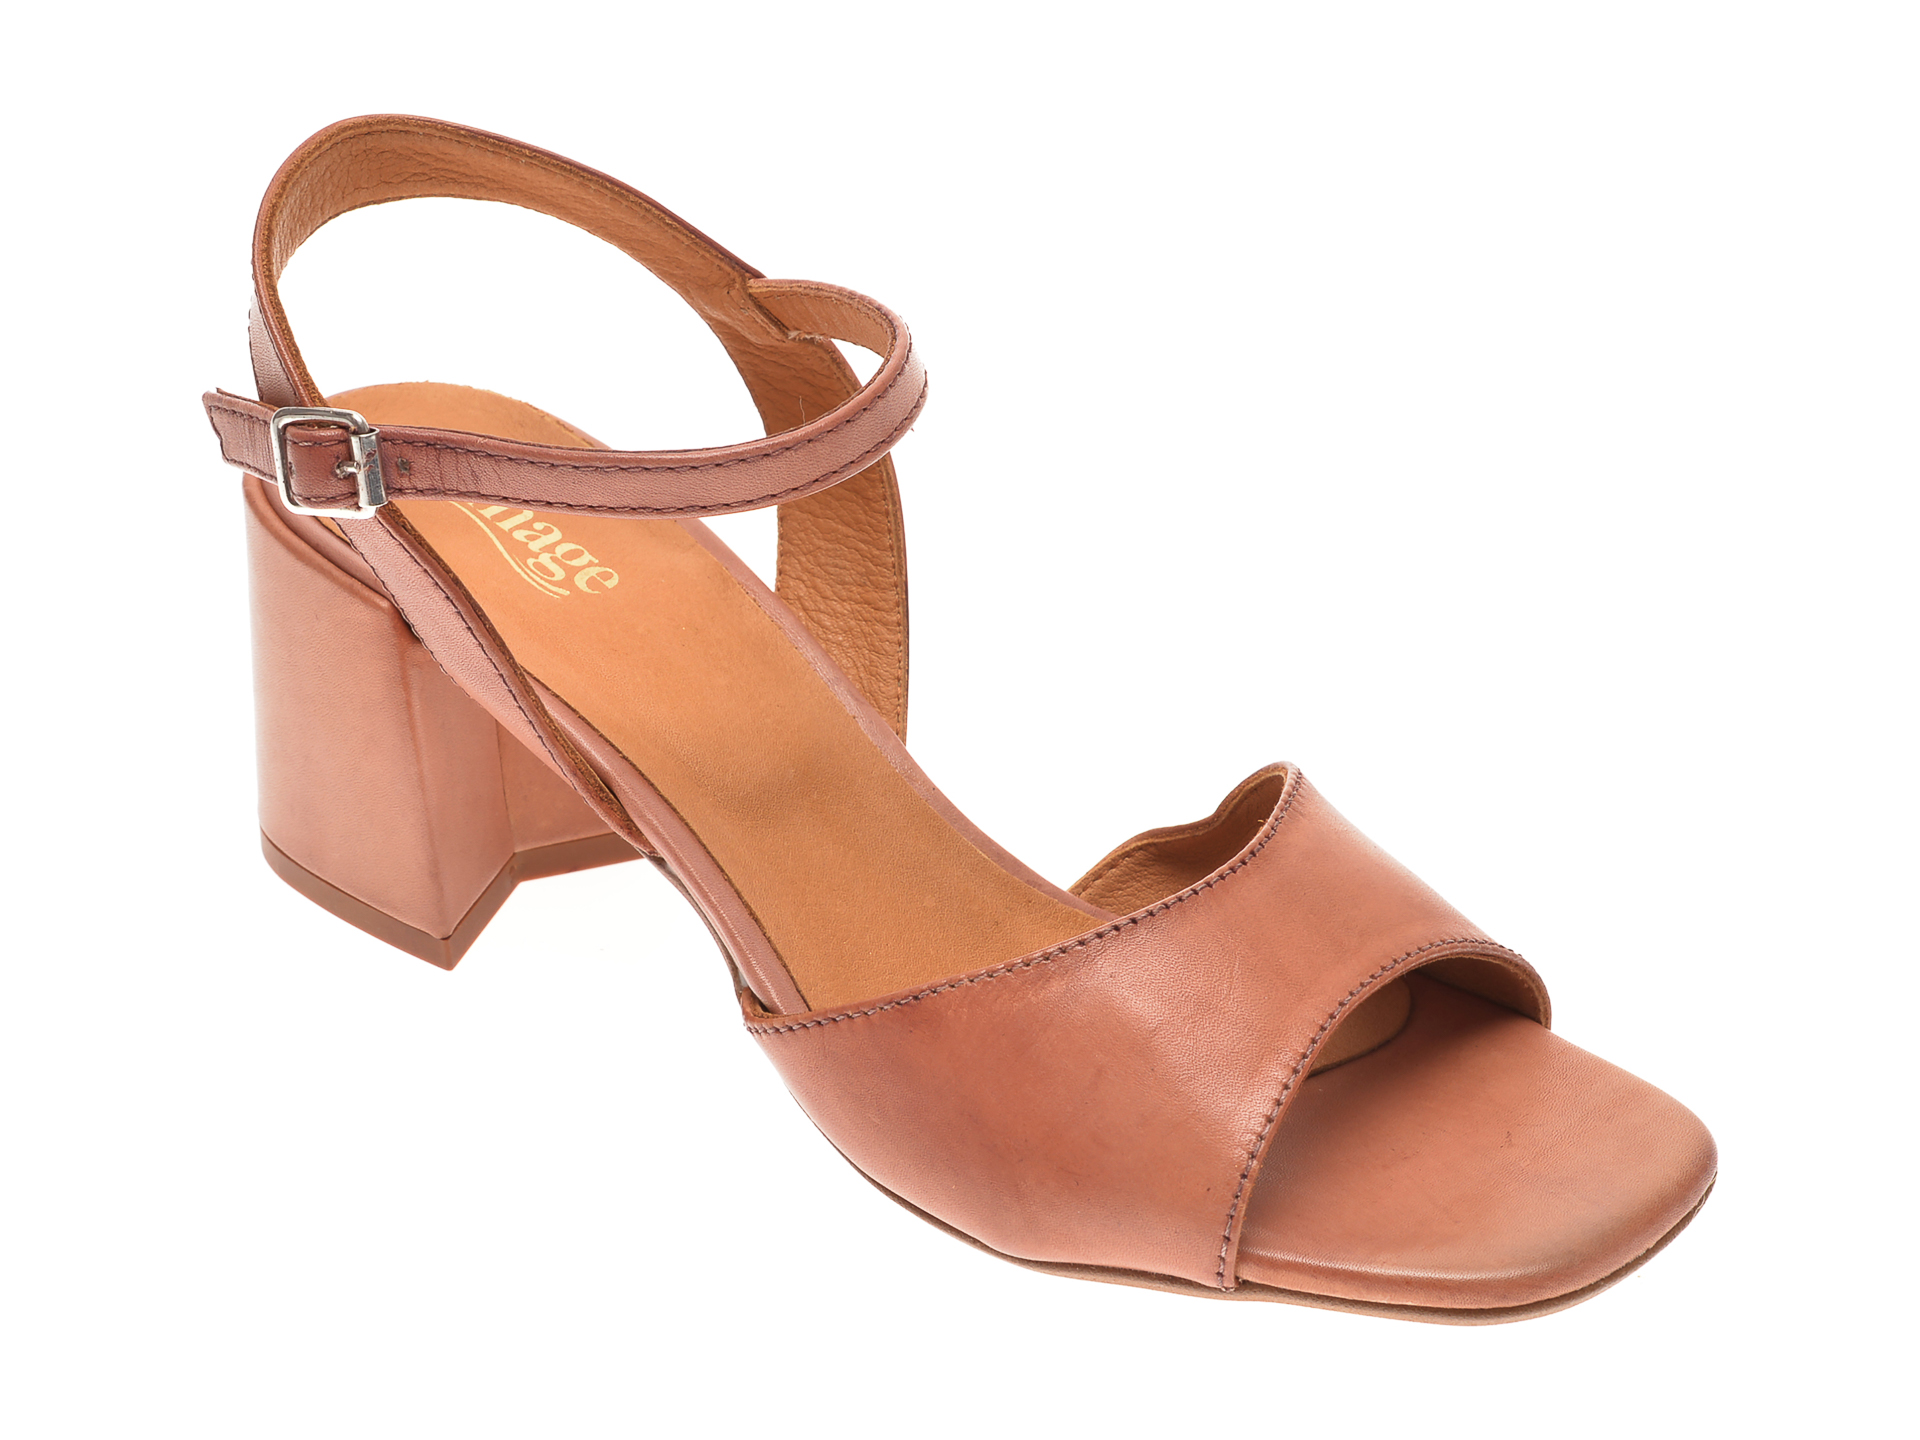 Sandale IMAGE maro, 2219, din piele naturala New